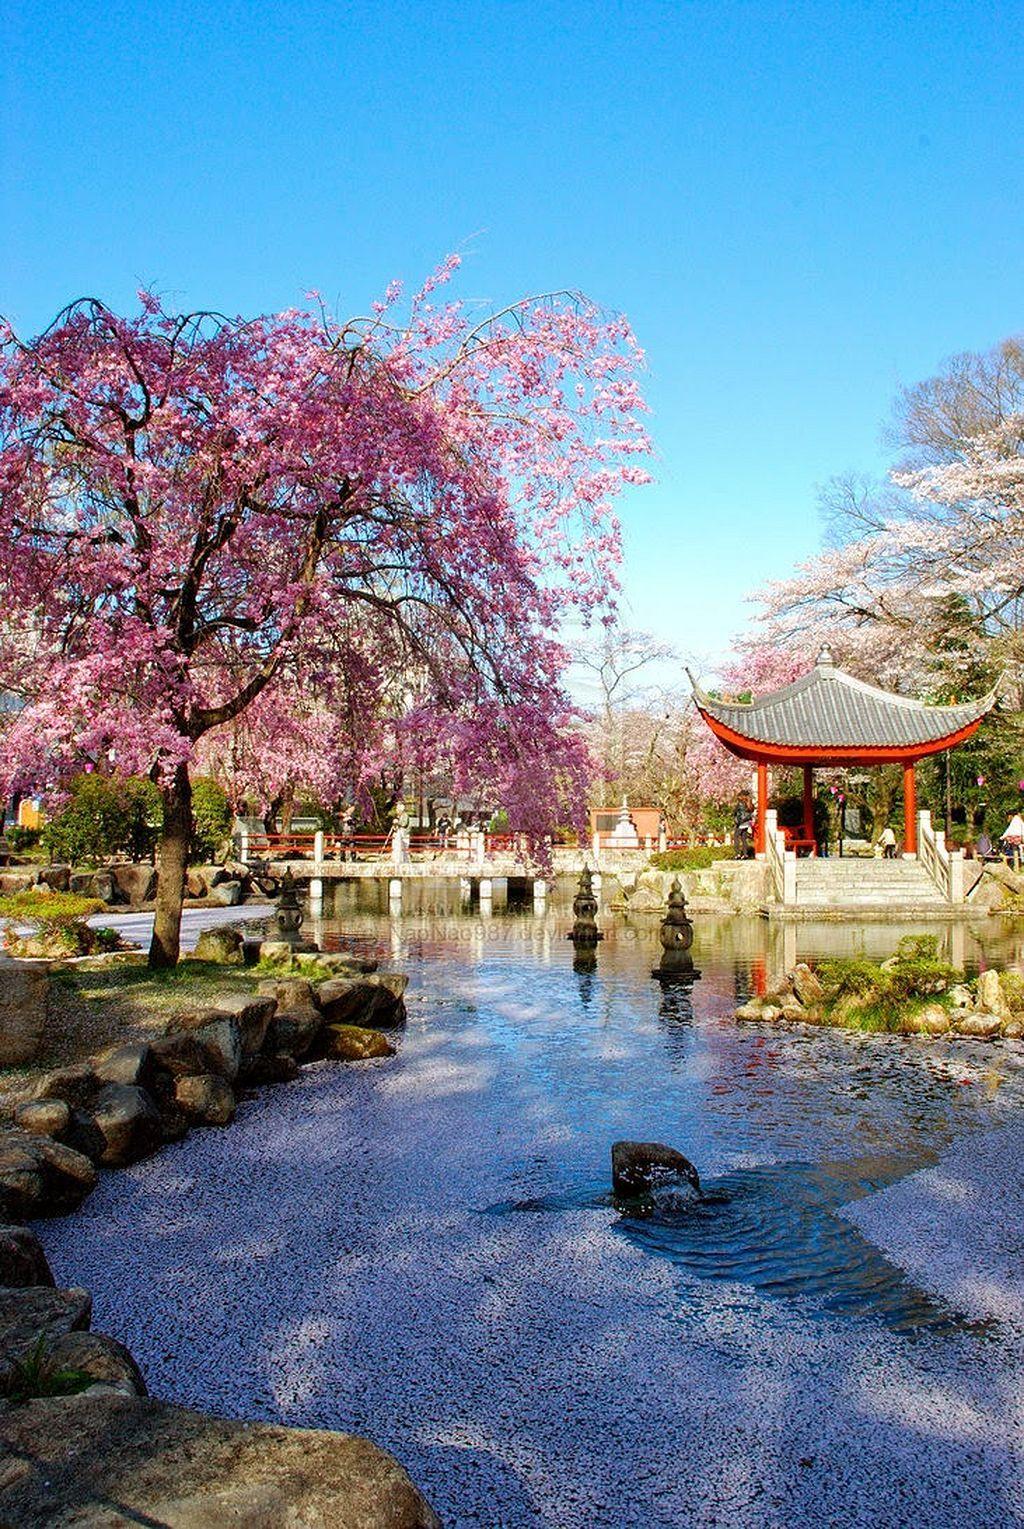 Awesome 20 Beautiful Cherry Blossom Garden Https Gardenmagz Com 20 Beautiful Cherry Blossom Gard Cherry Blossom Japan Japanese Garden Design Japanese Garden